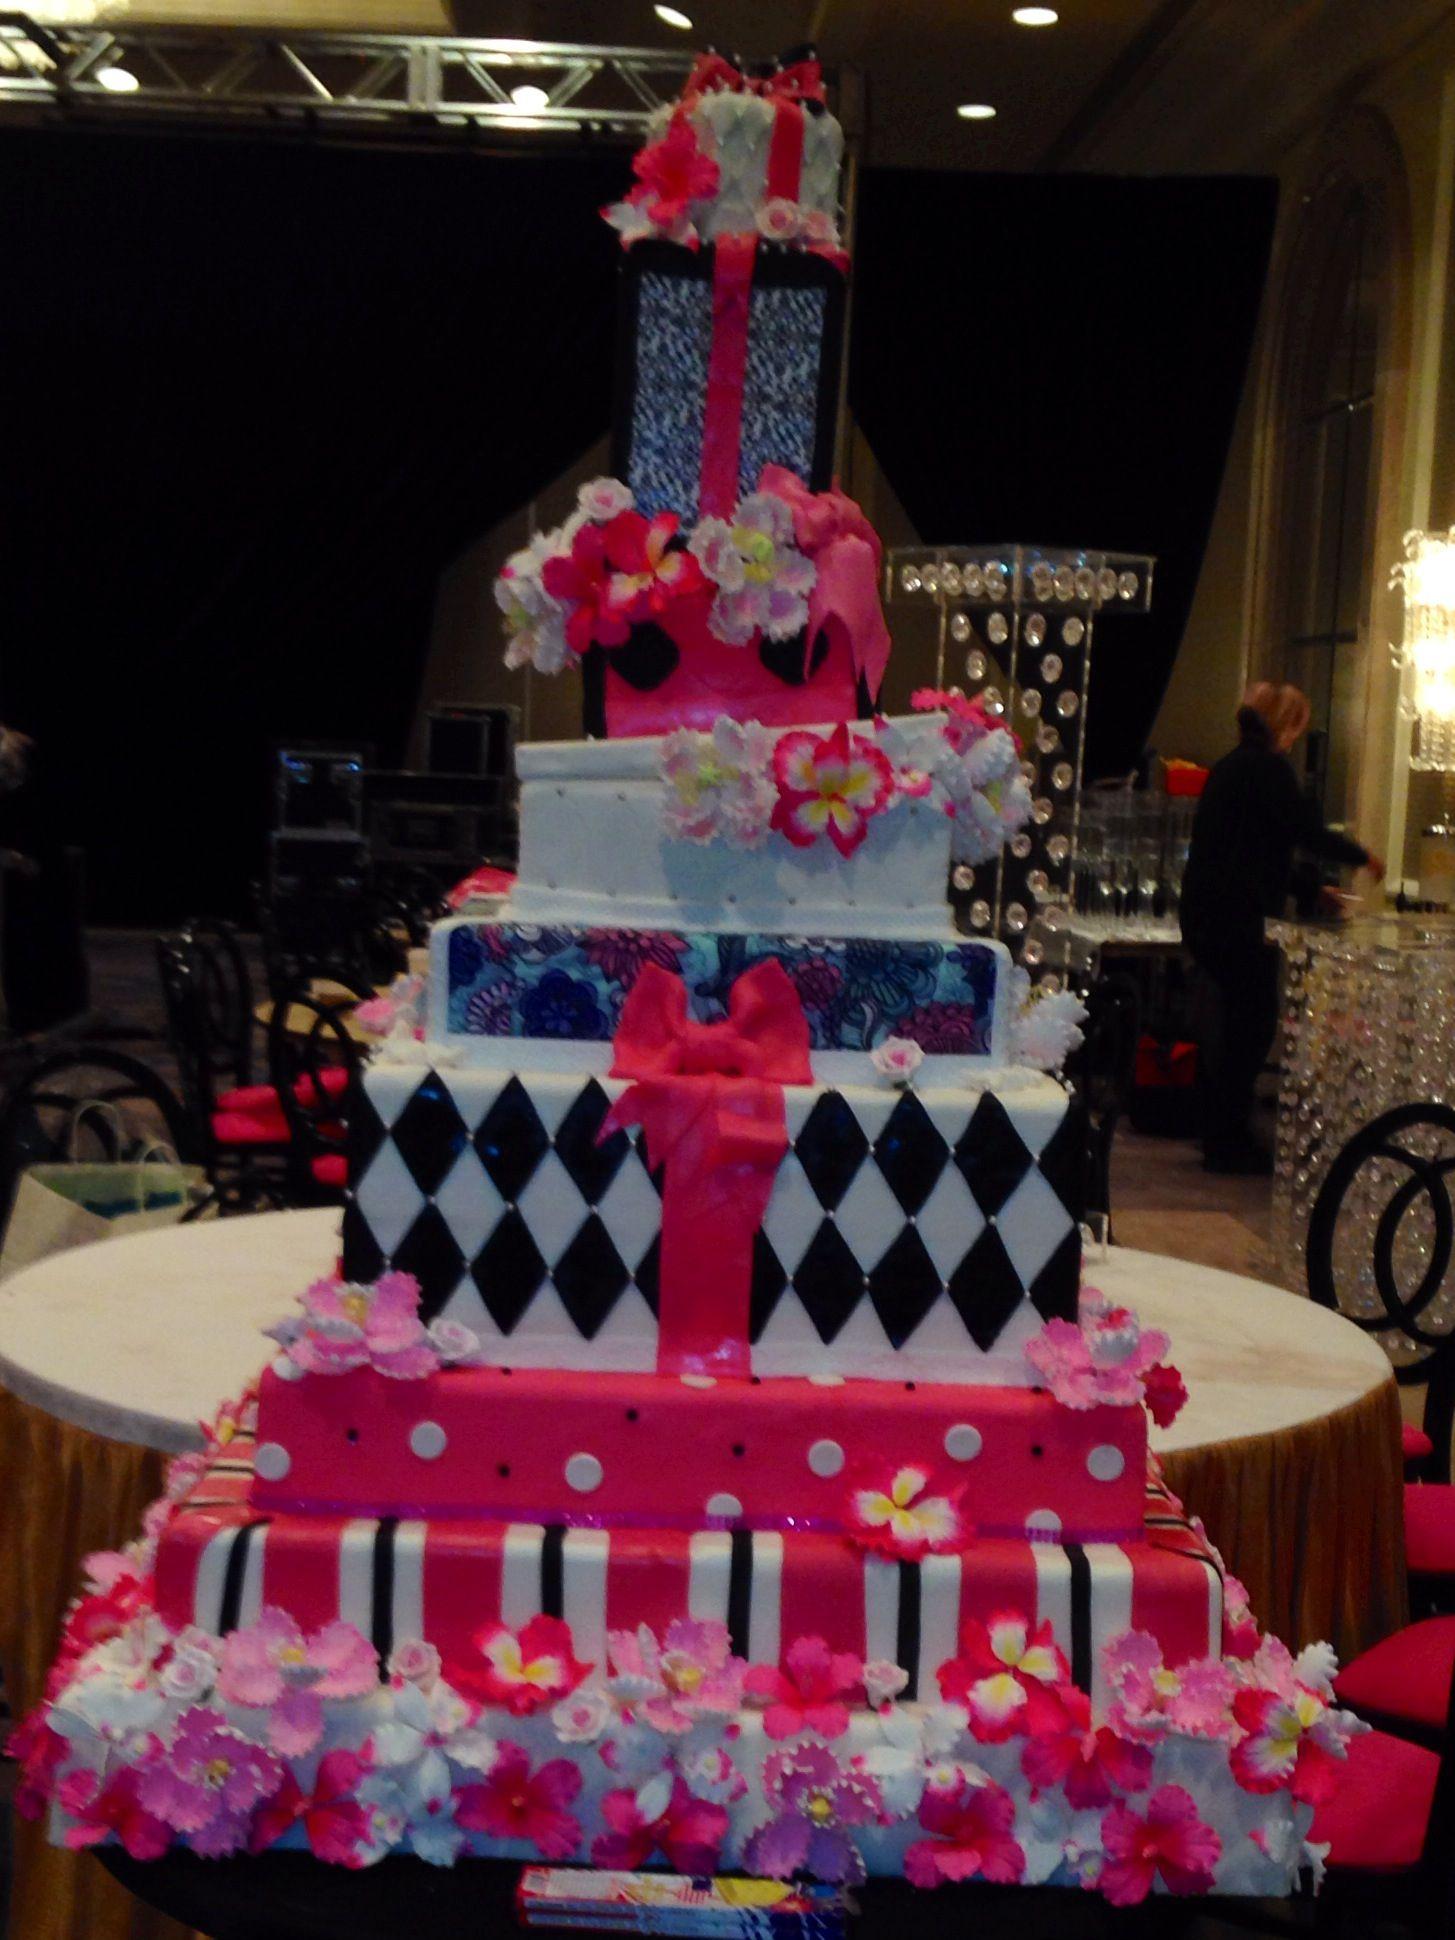 Giant birthday cake giant birthday cake cake mary birthday